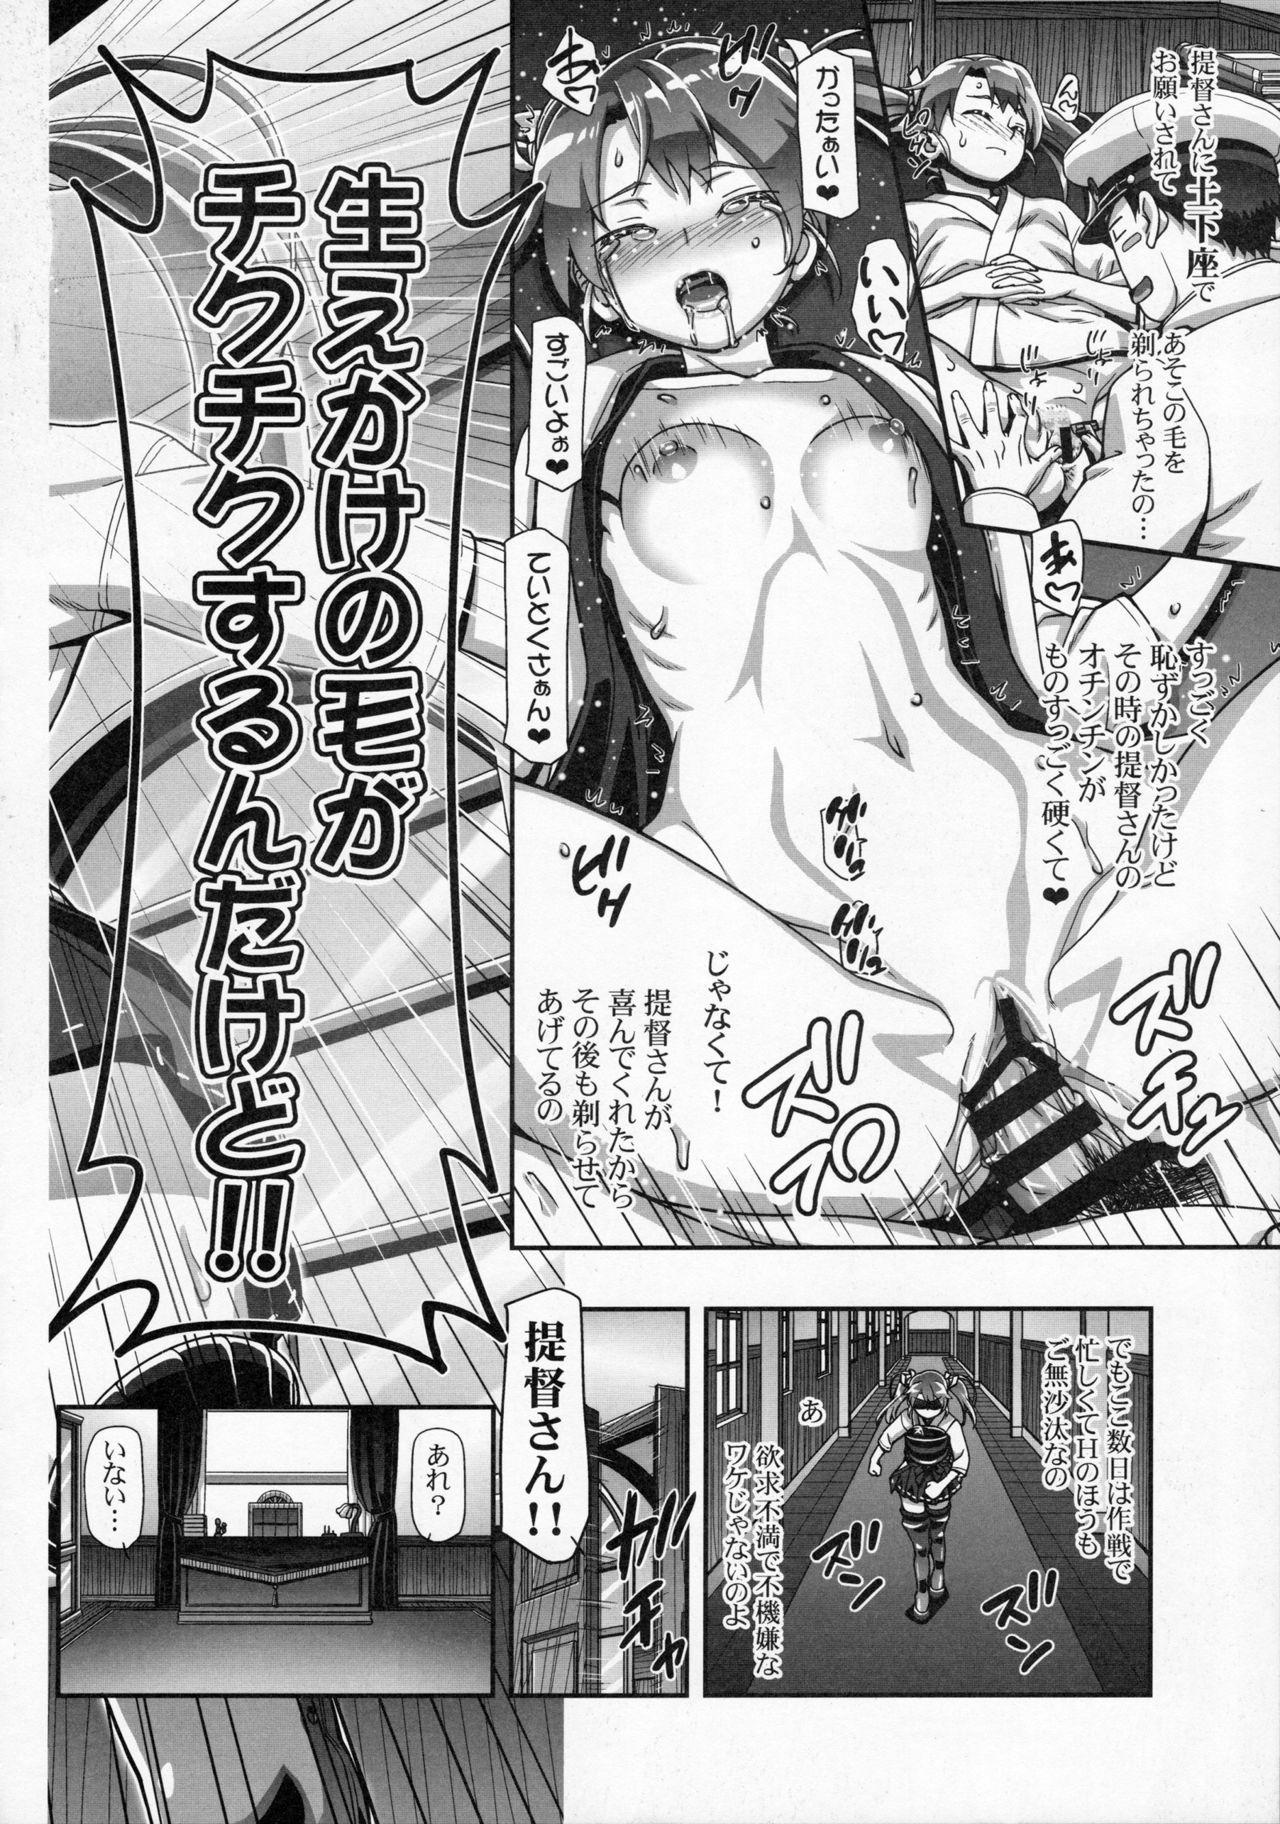 (COMIC1☆10) [Gambler Club (Kousaka Jun)] Teimou Kantai - Teitoku-san! Chikuchiku surun dakedo!! (Kantai Collection -KanColle-) 3